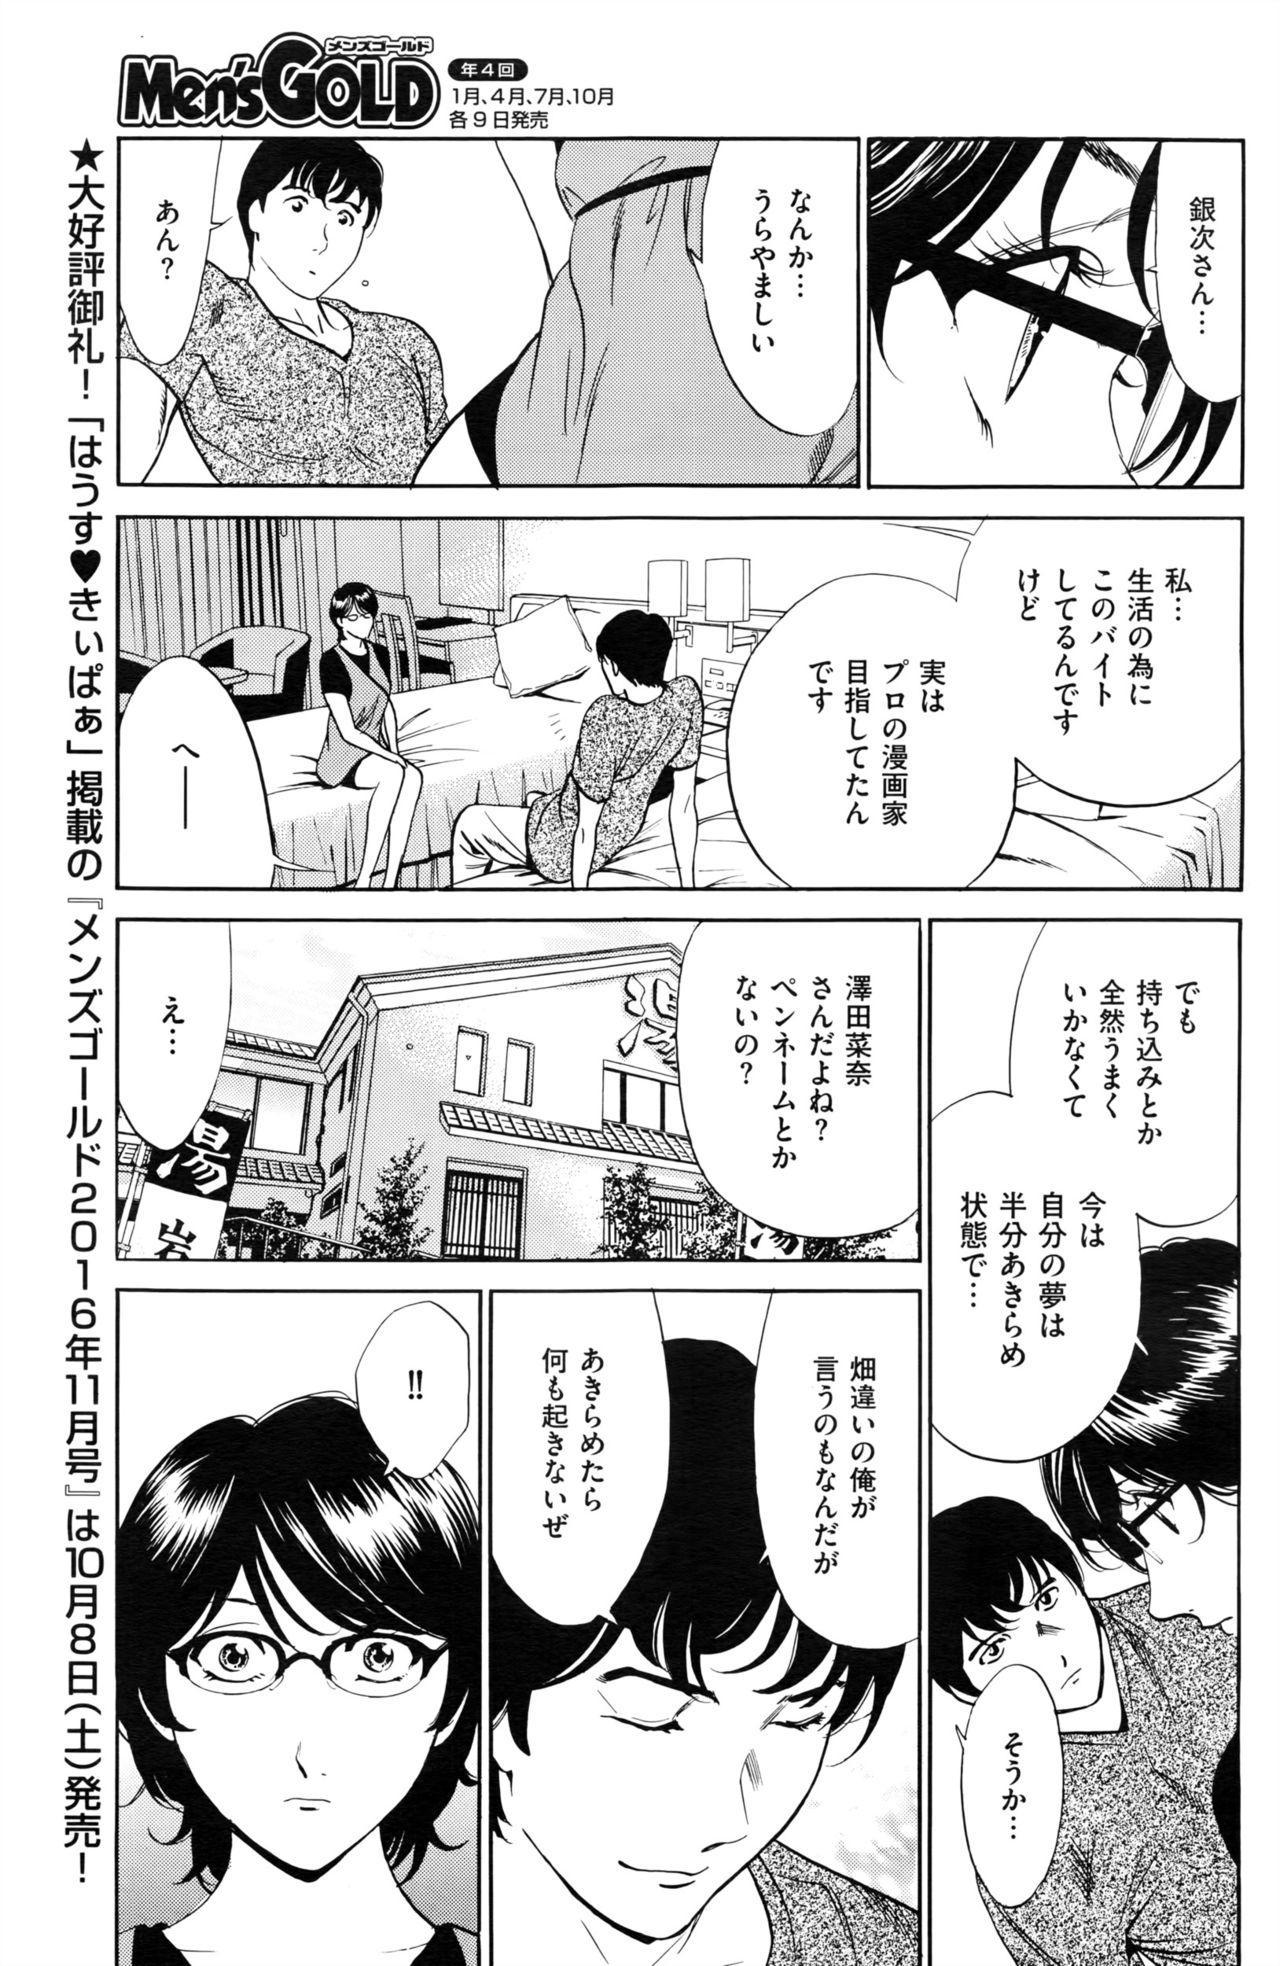 Wa Usuki Ipa a 1-10 67